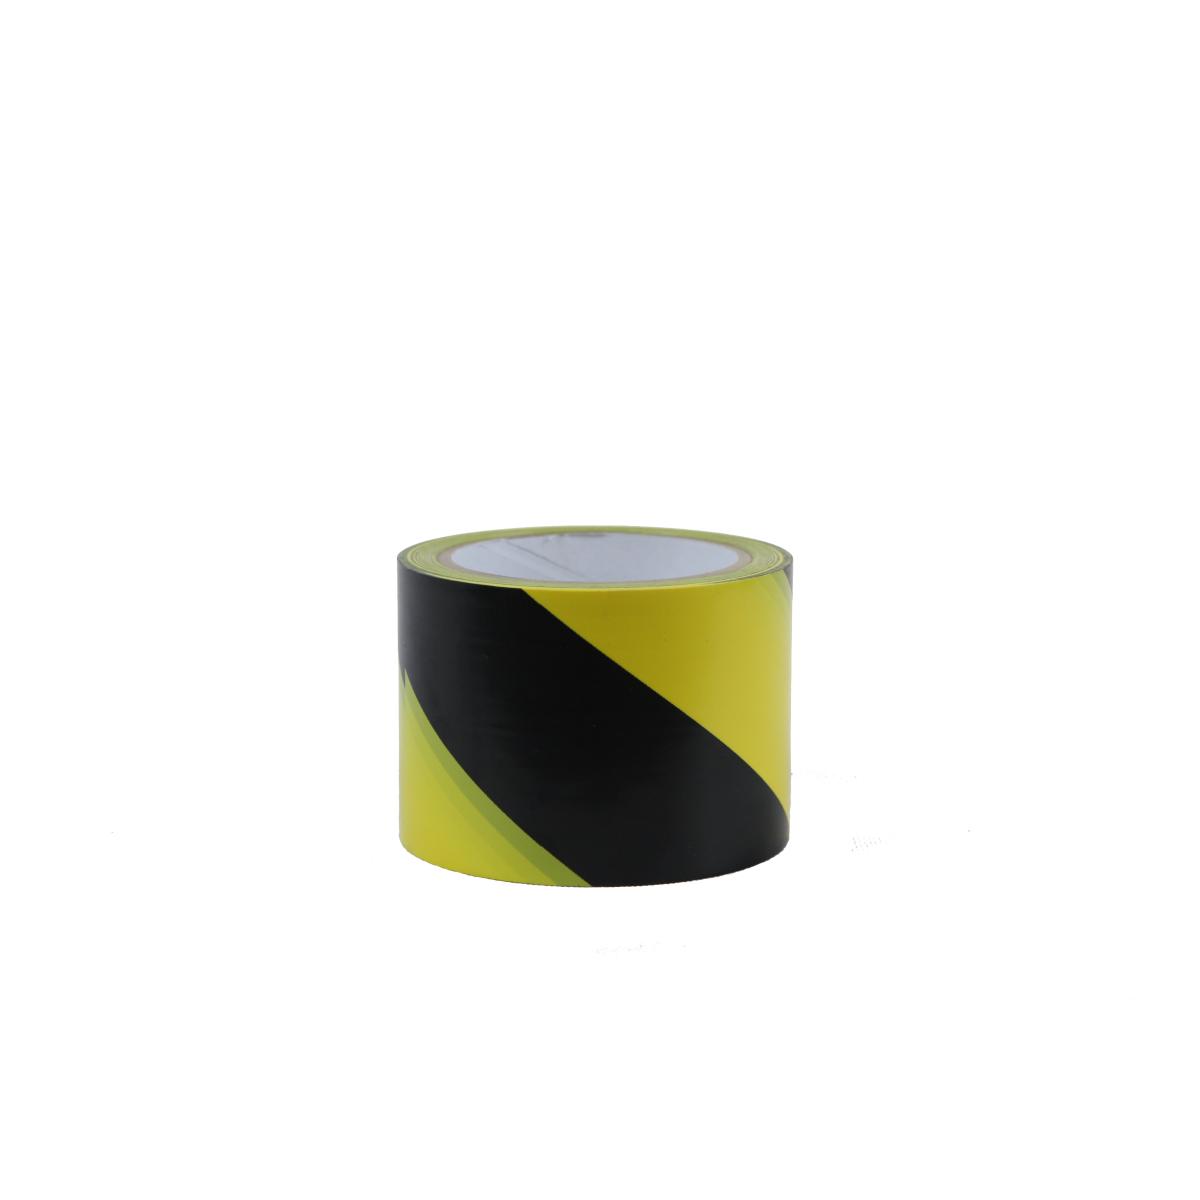 Лента ПВХ для разметки, желто/черный 75 мм *33 м